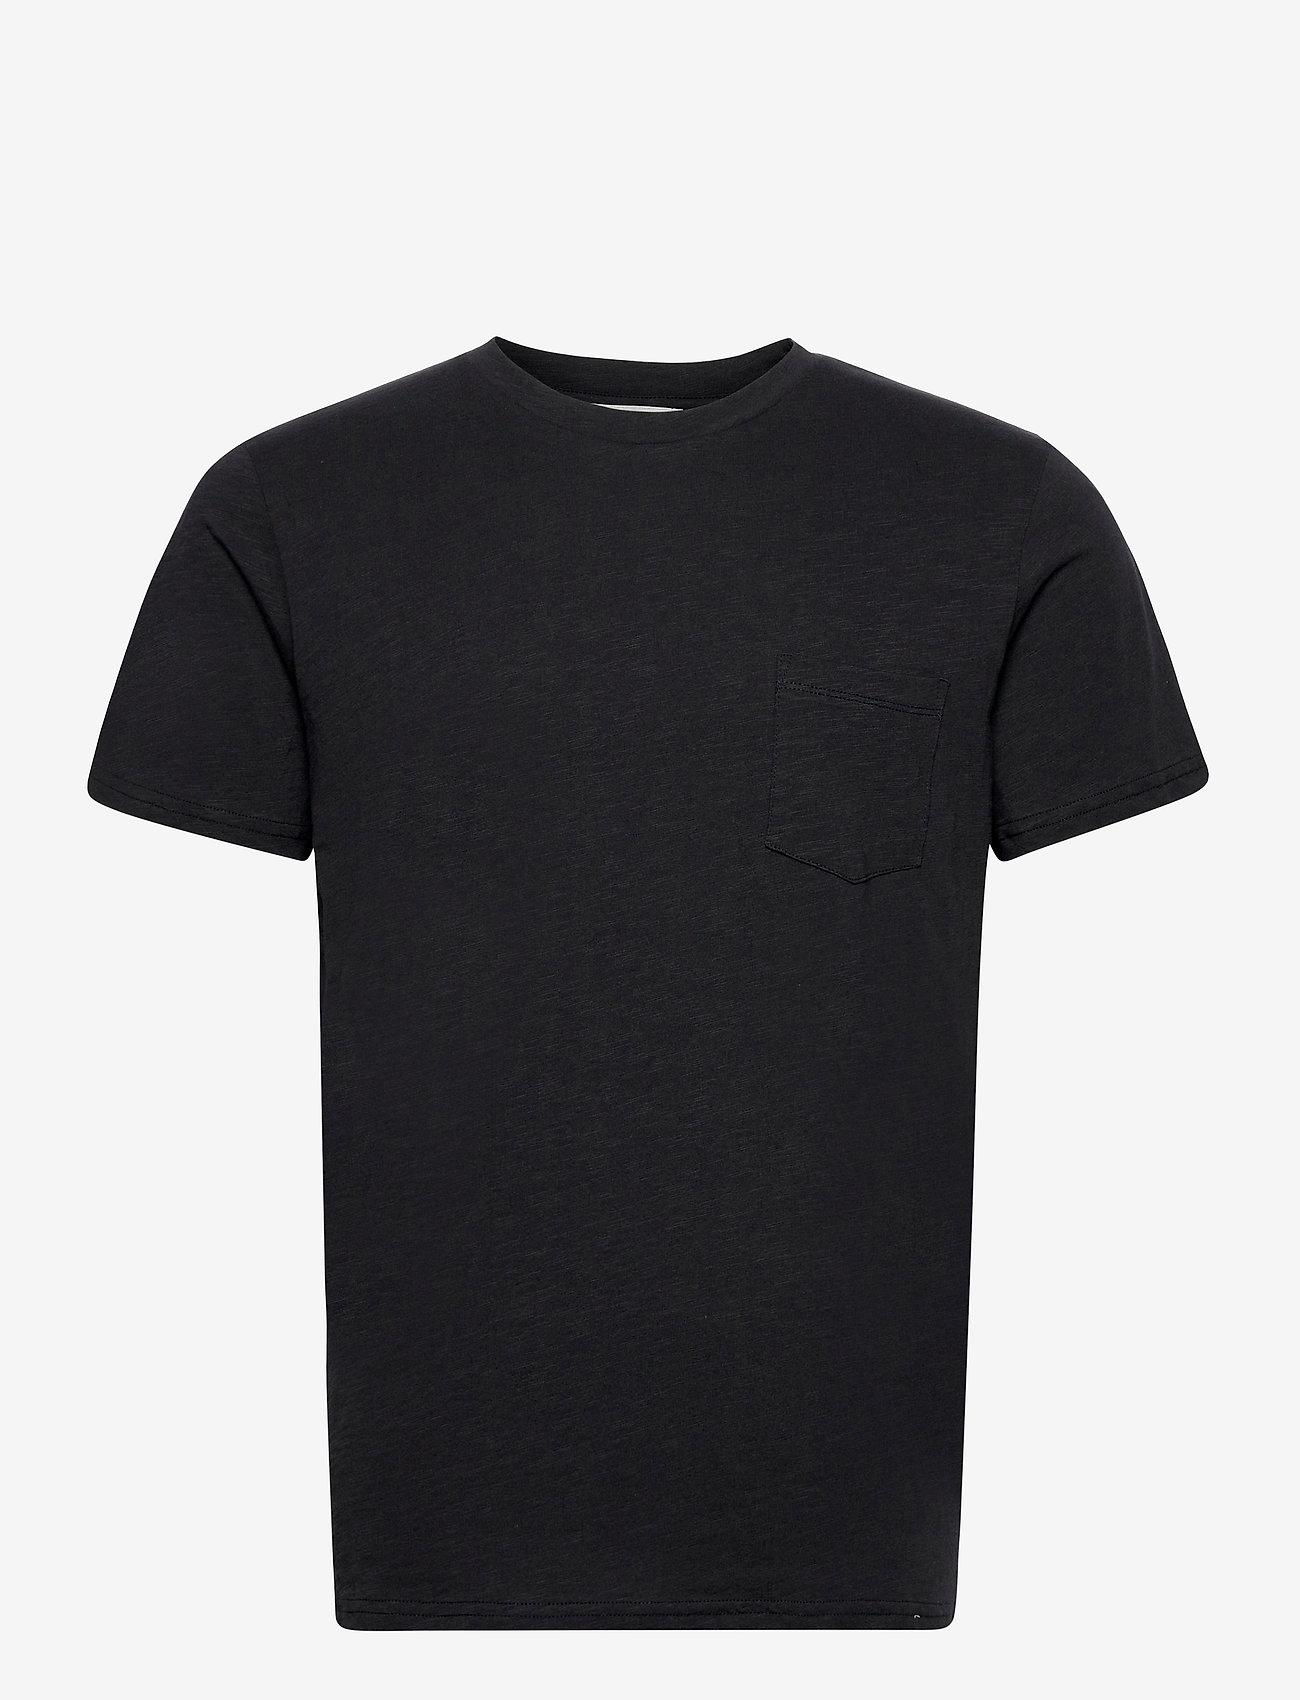 By Garment Makers - The Organic Tee w. pocket - podstawowe koszulki - jet black - 1